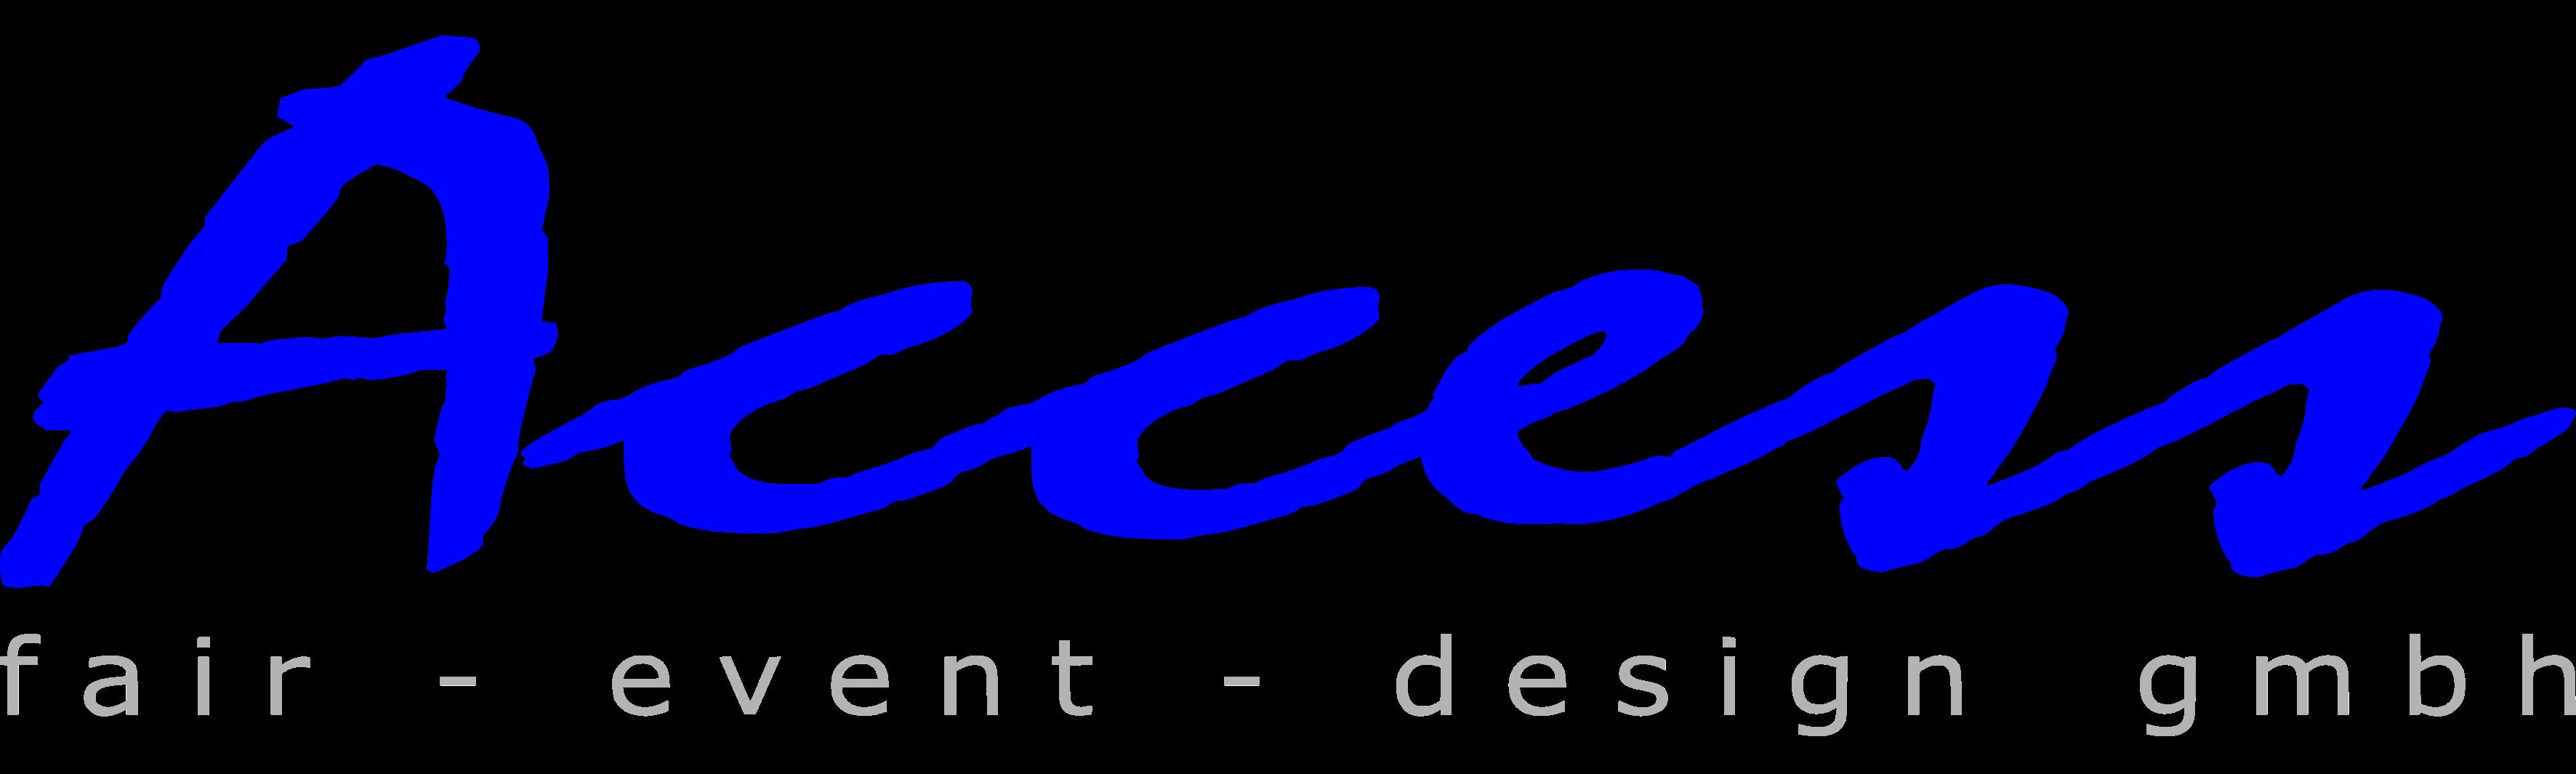 Access fair event design GmbH München